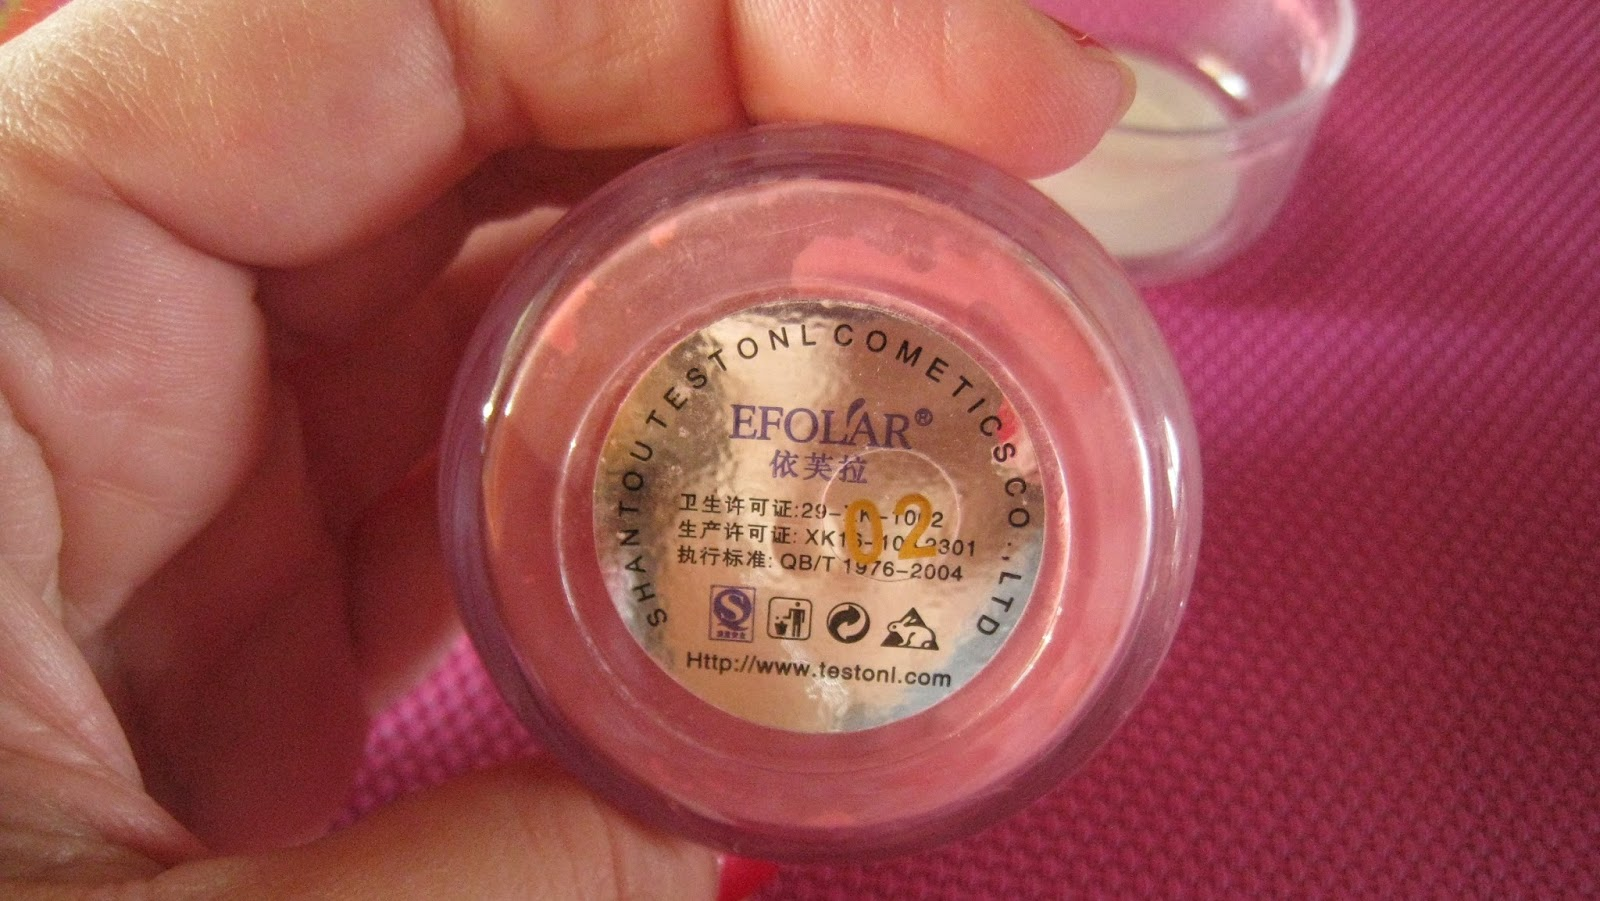 Efolar Bright Blush Bb Cream Makeup Blusher Mineral Powder Puff Peach Pink 02 Bioaqua On Cushion Flawless Cheek I Got This In The Color Shimmer